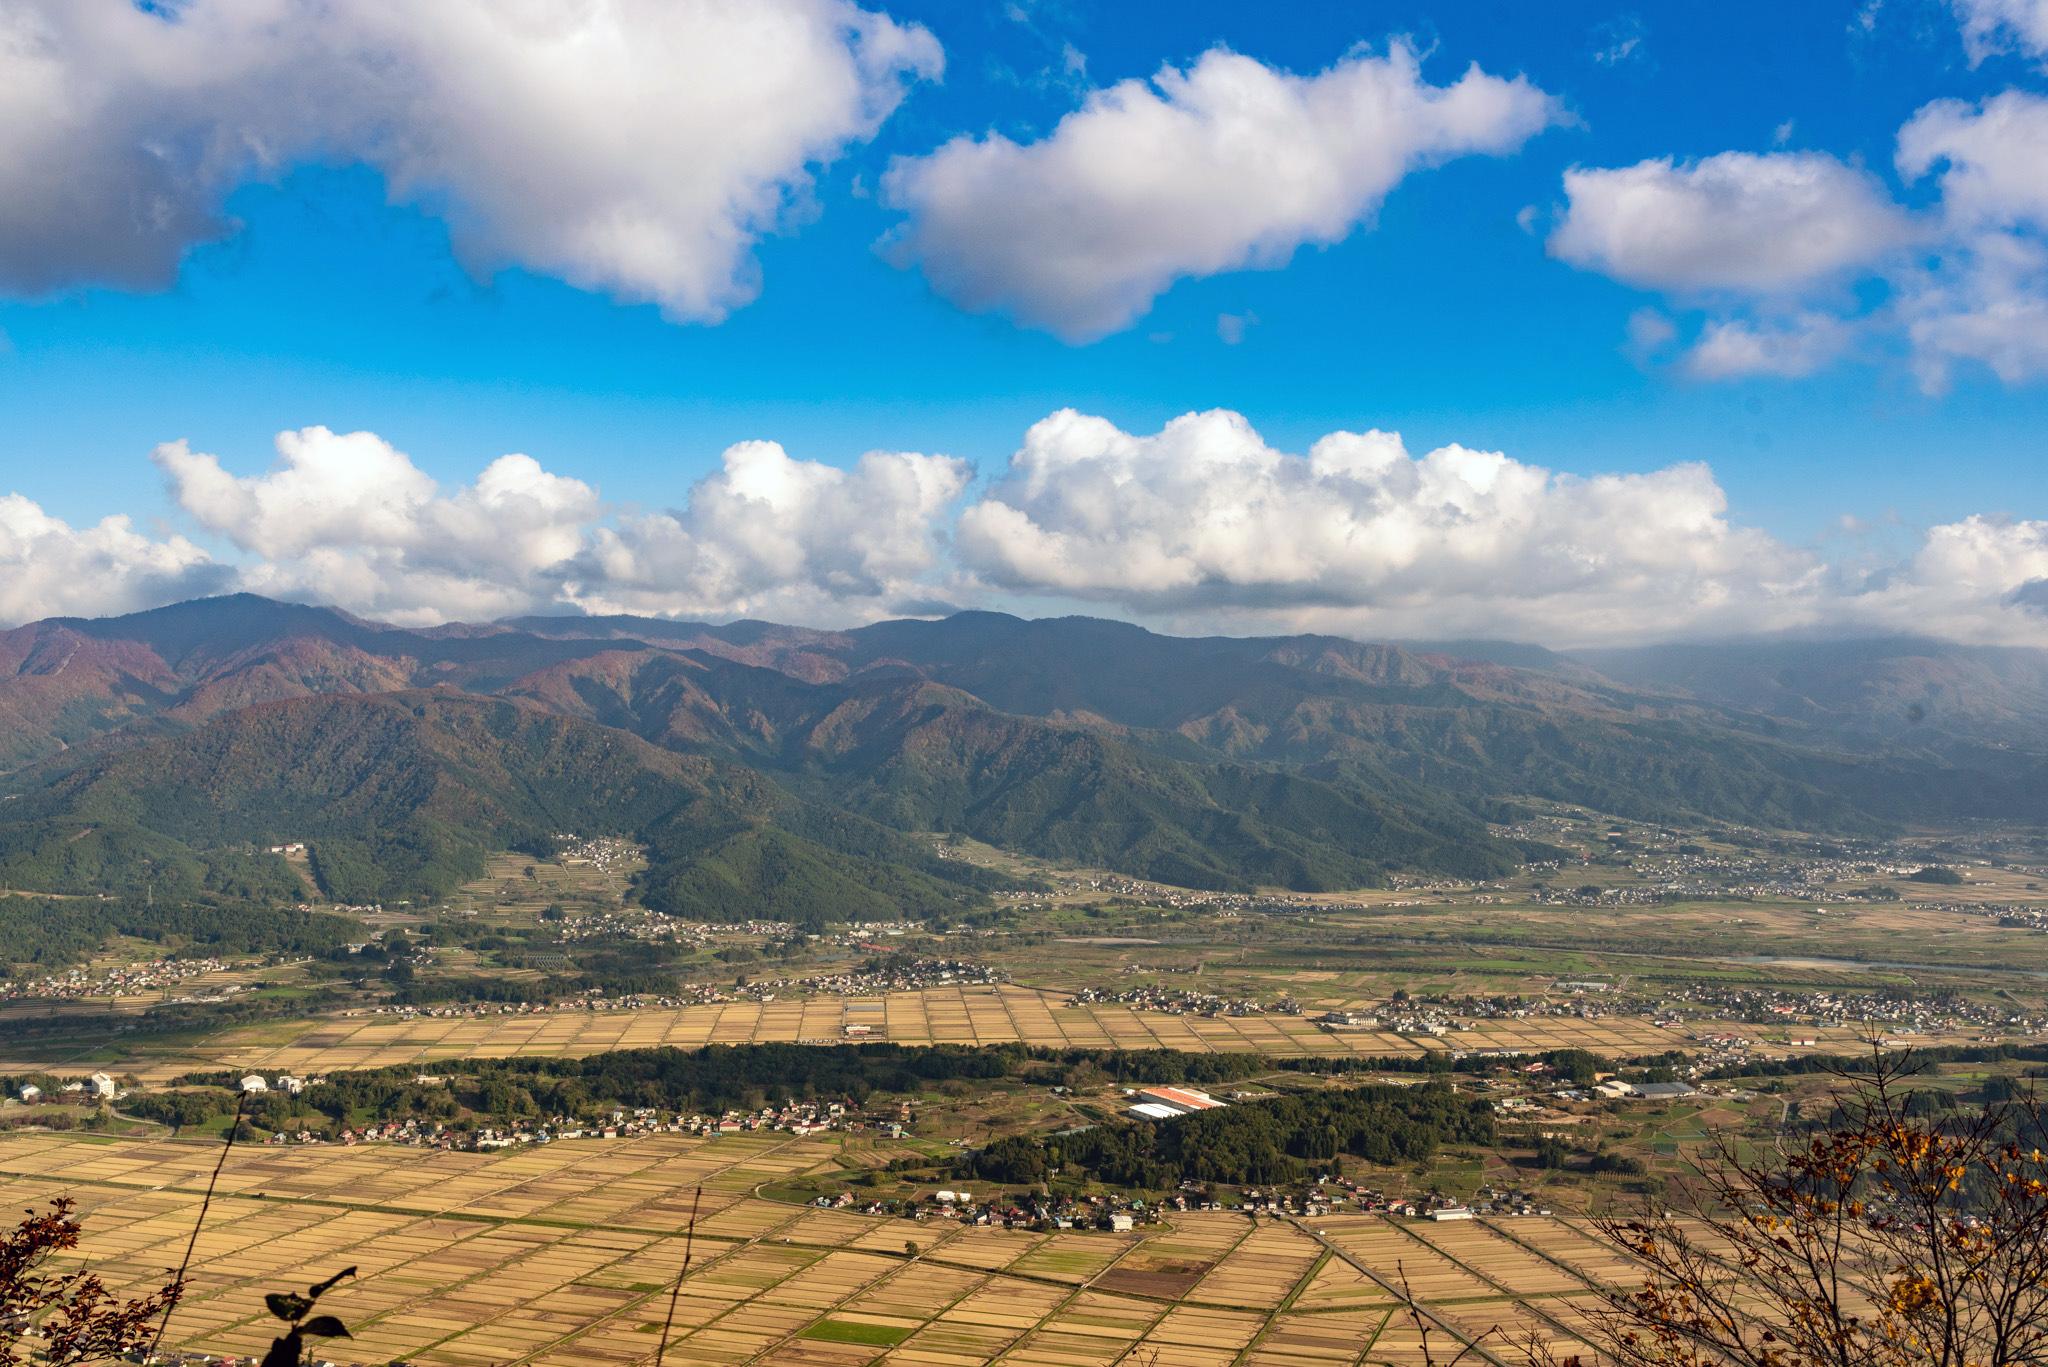 Incredible views along the Shin-Etsu Trail